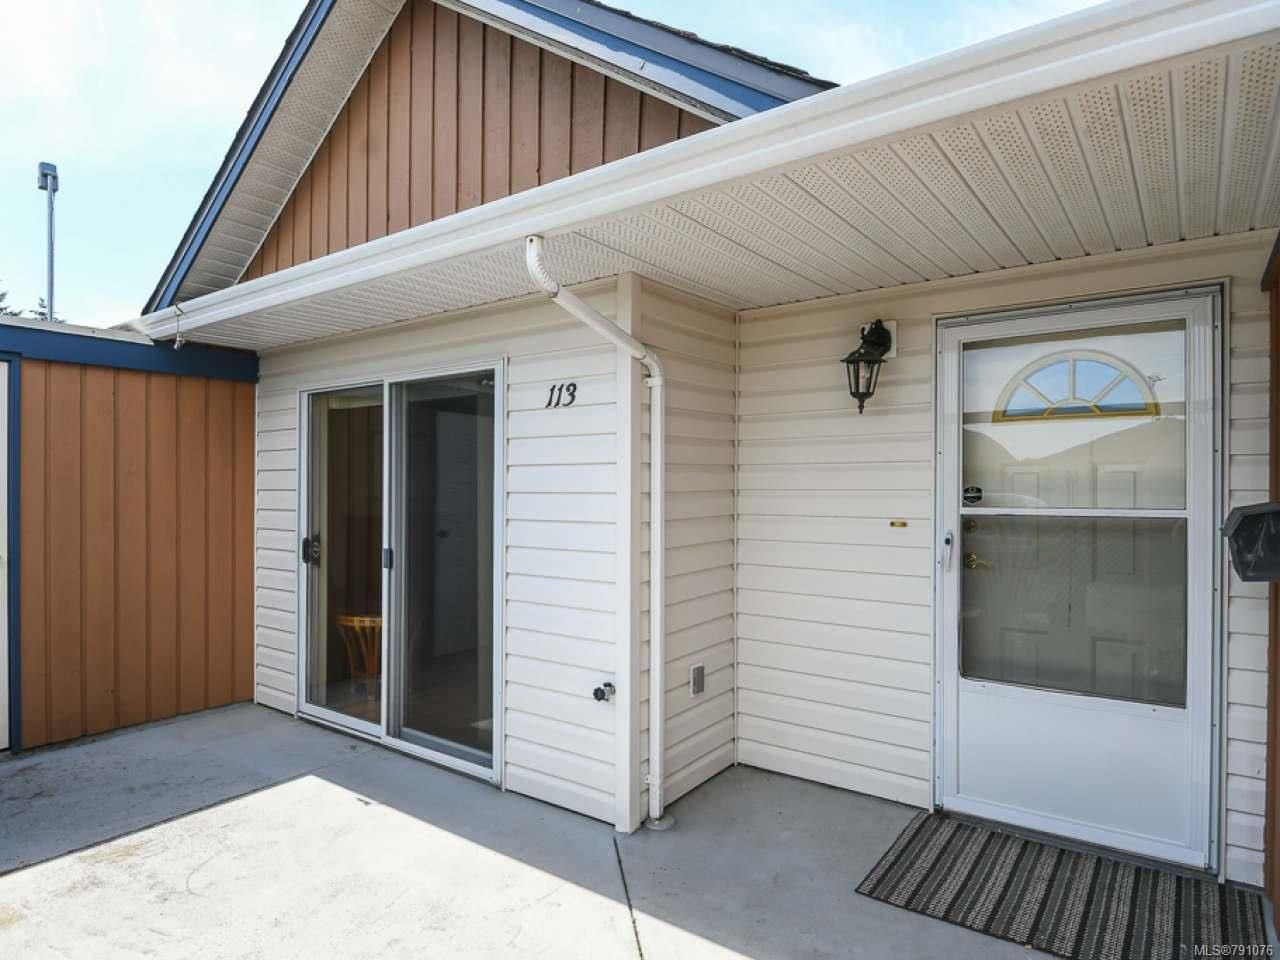 Main Photo: 113 675 Aspen Rd in COMOX: CV Comox (Town of) Row/Townhouse for sale (Comox Valley)  : MLS®# 791076